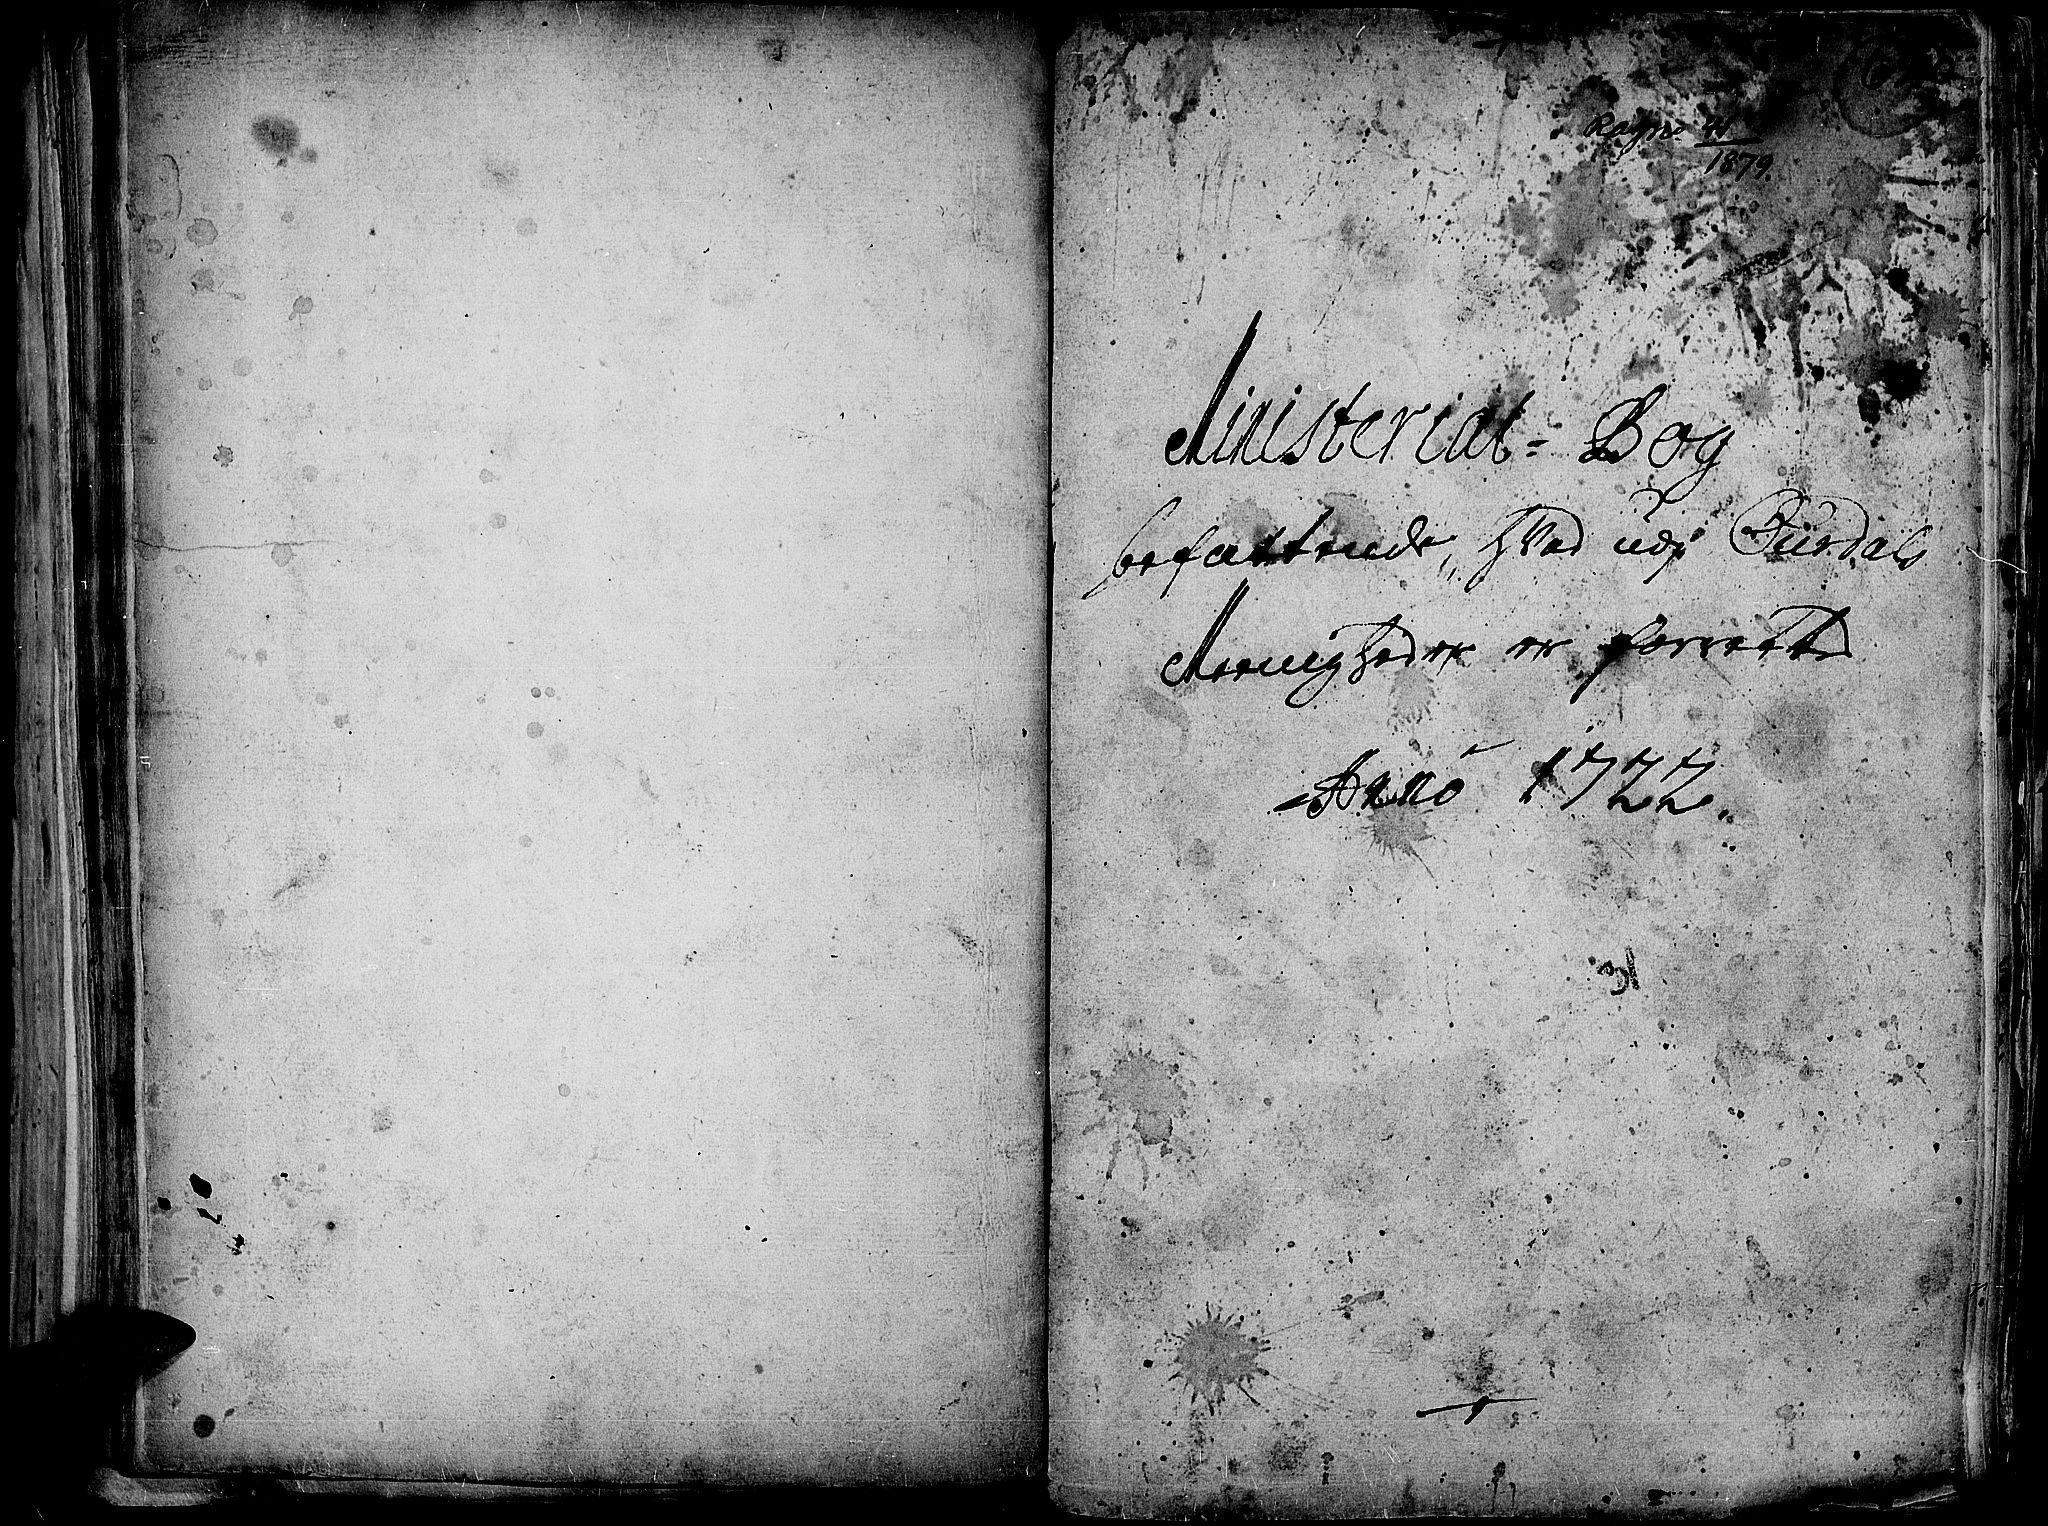 SAH, Aurdal prestekontor, Ministerialbok nr. 1-3, 1692-1730, s. 620